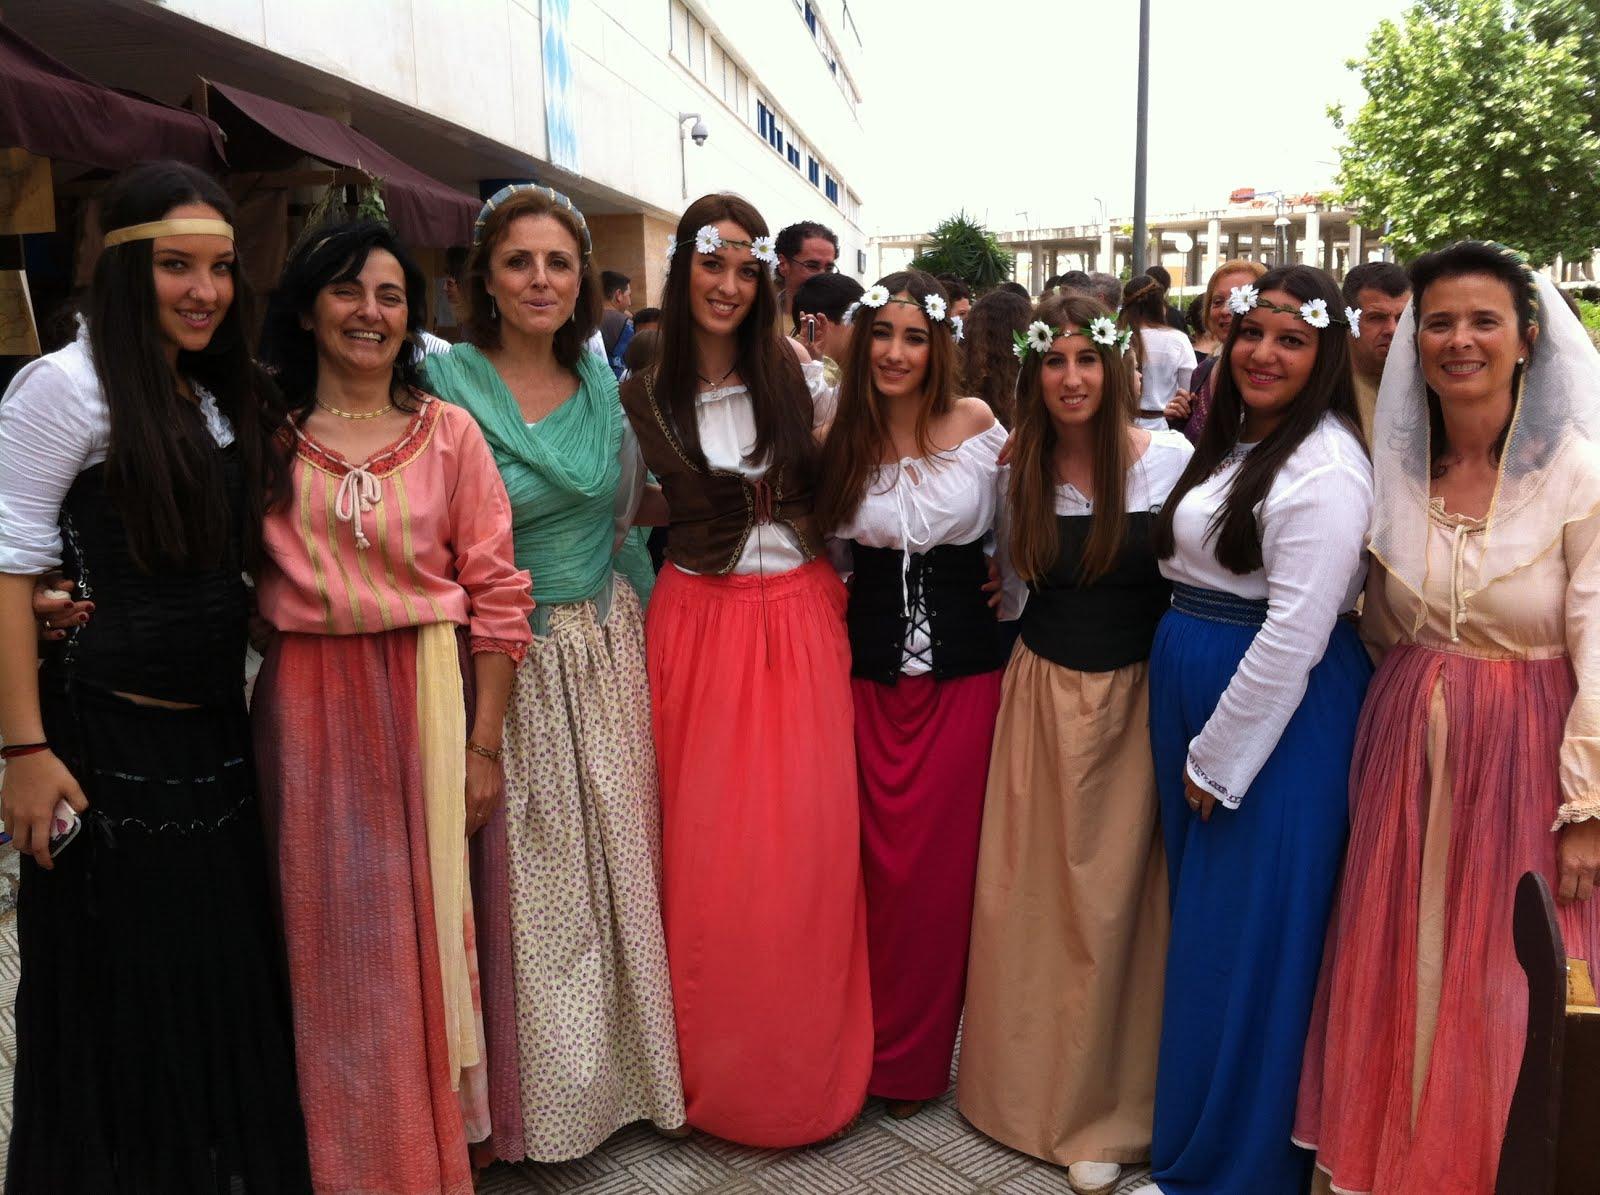 Jornadas culturales medievales